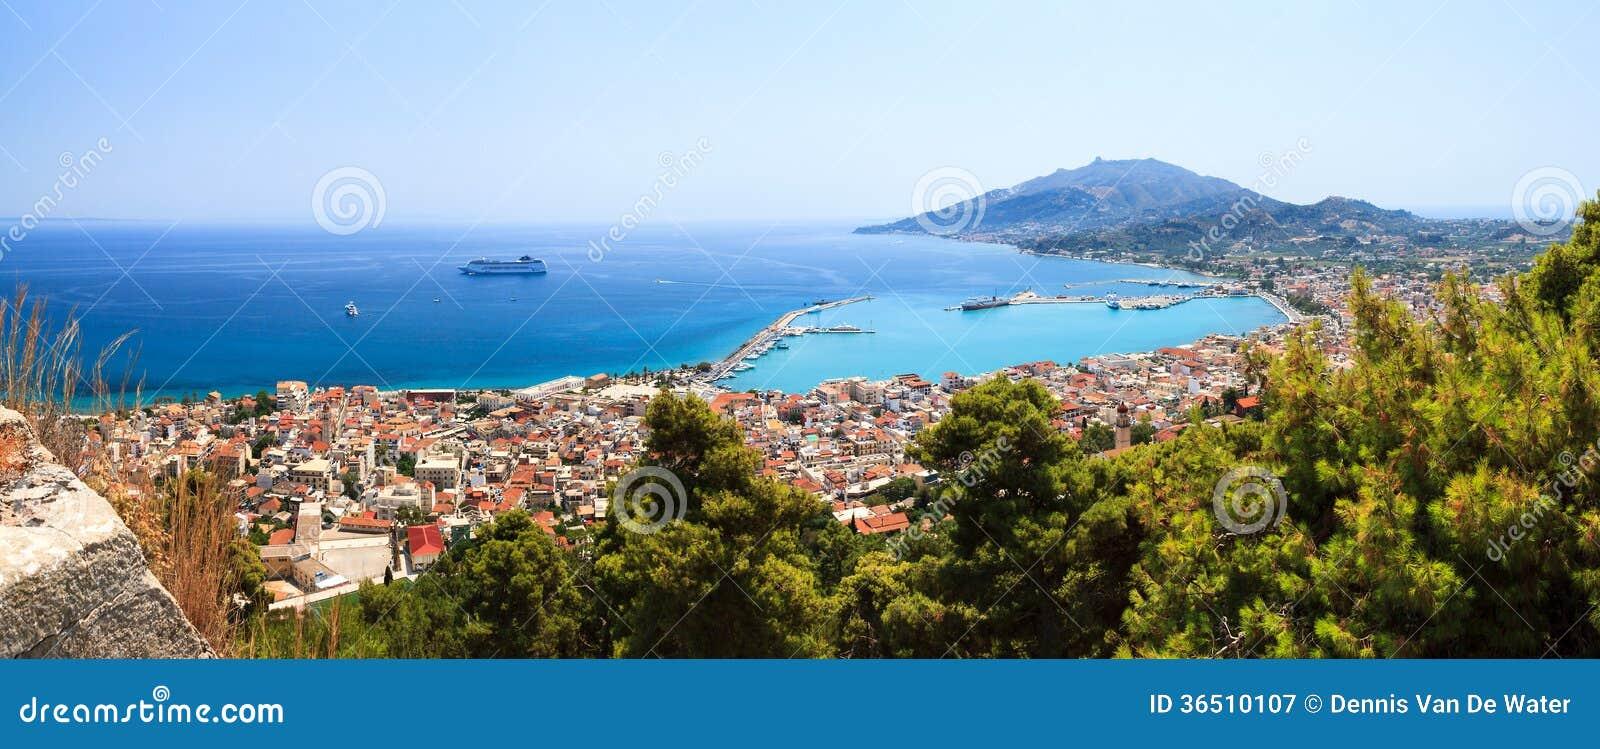 Paysage urbain de Zakynthos